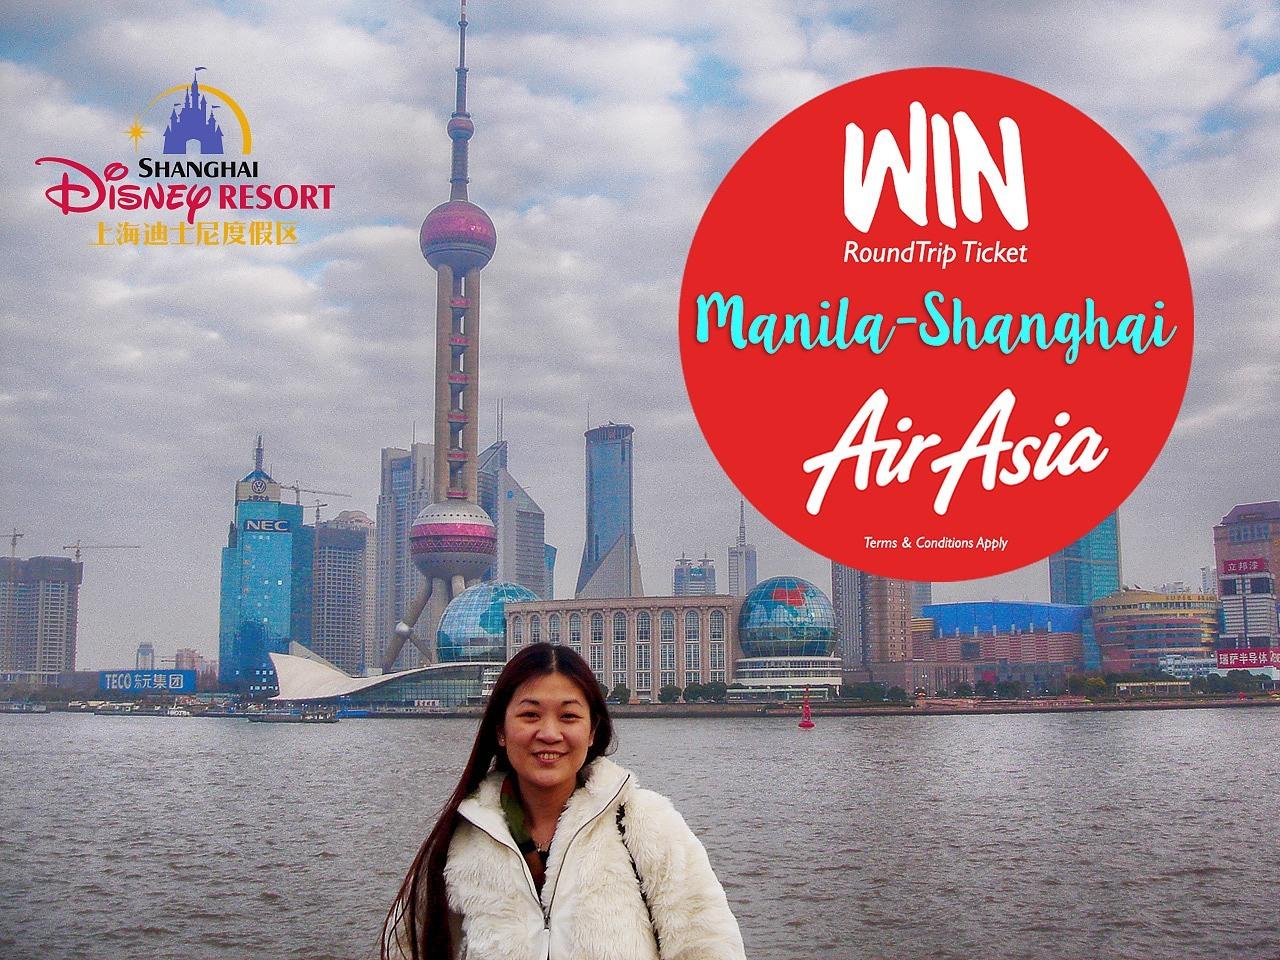 Airasia Manila Shanghai